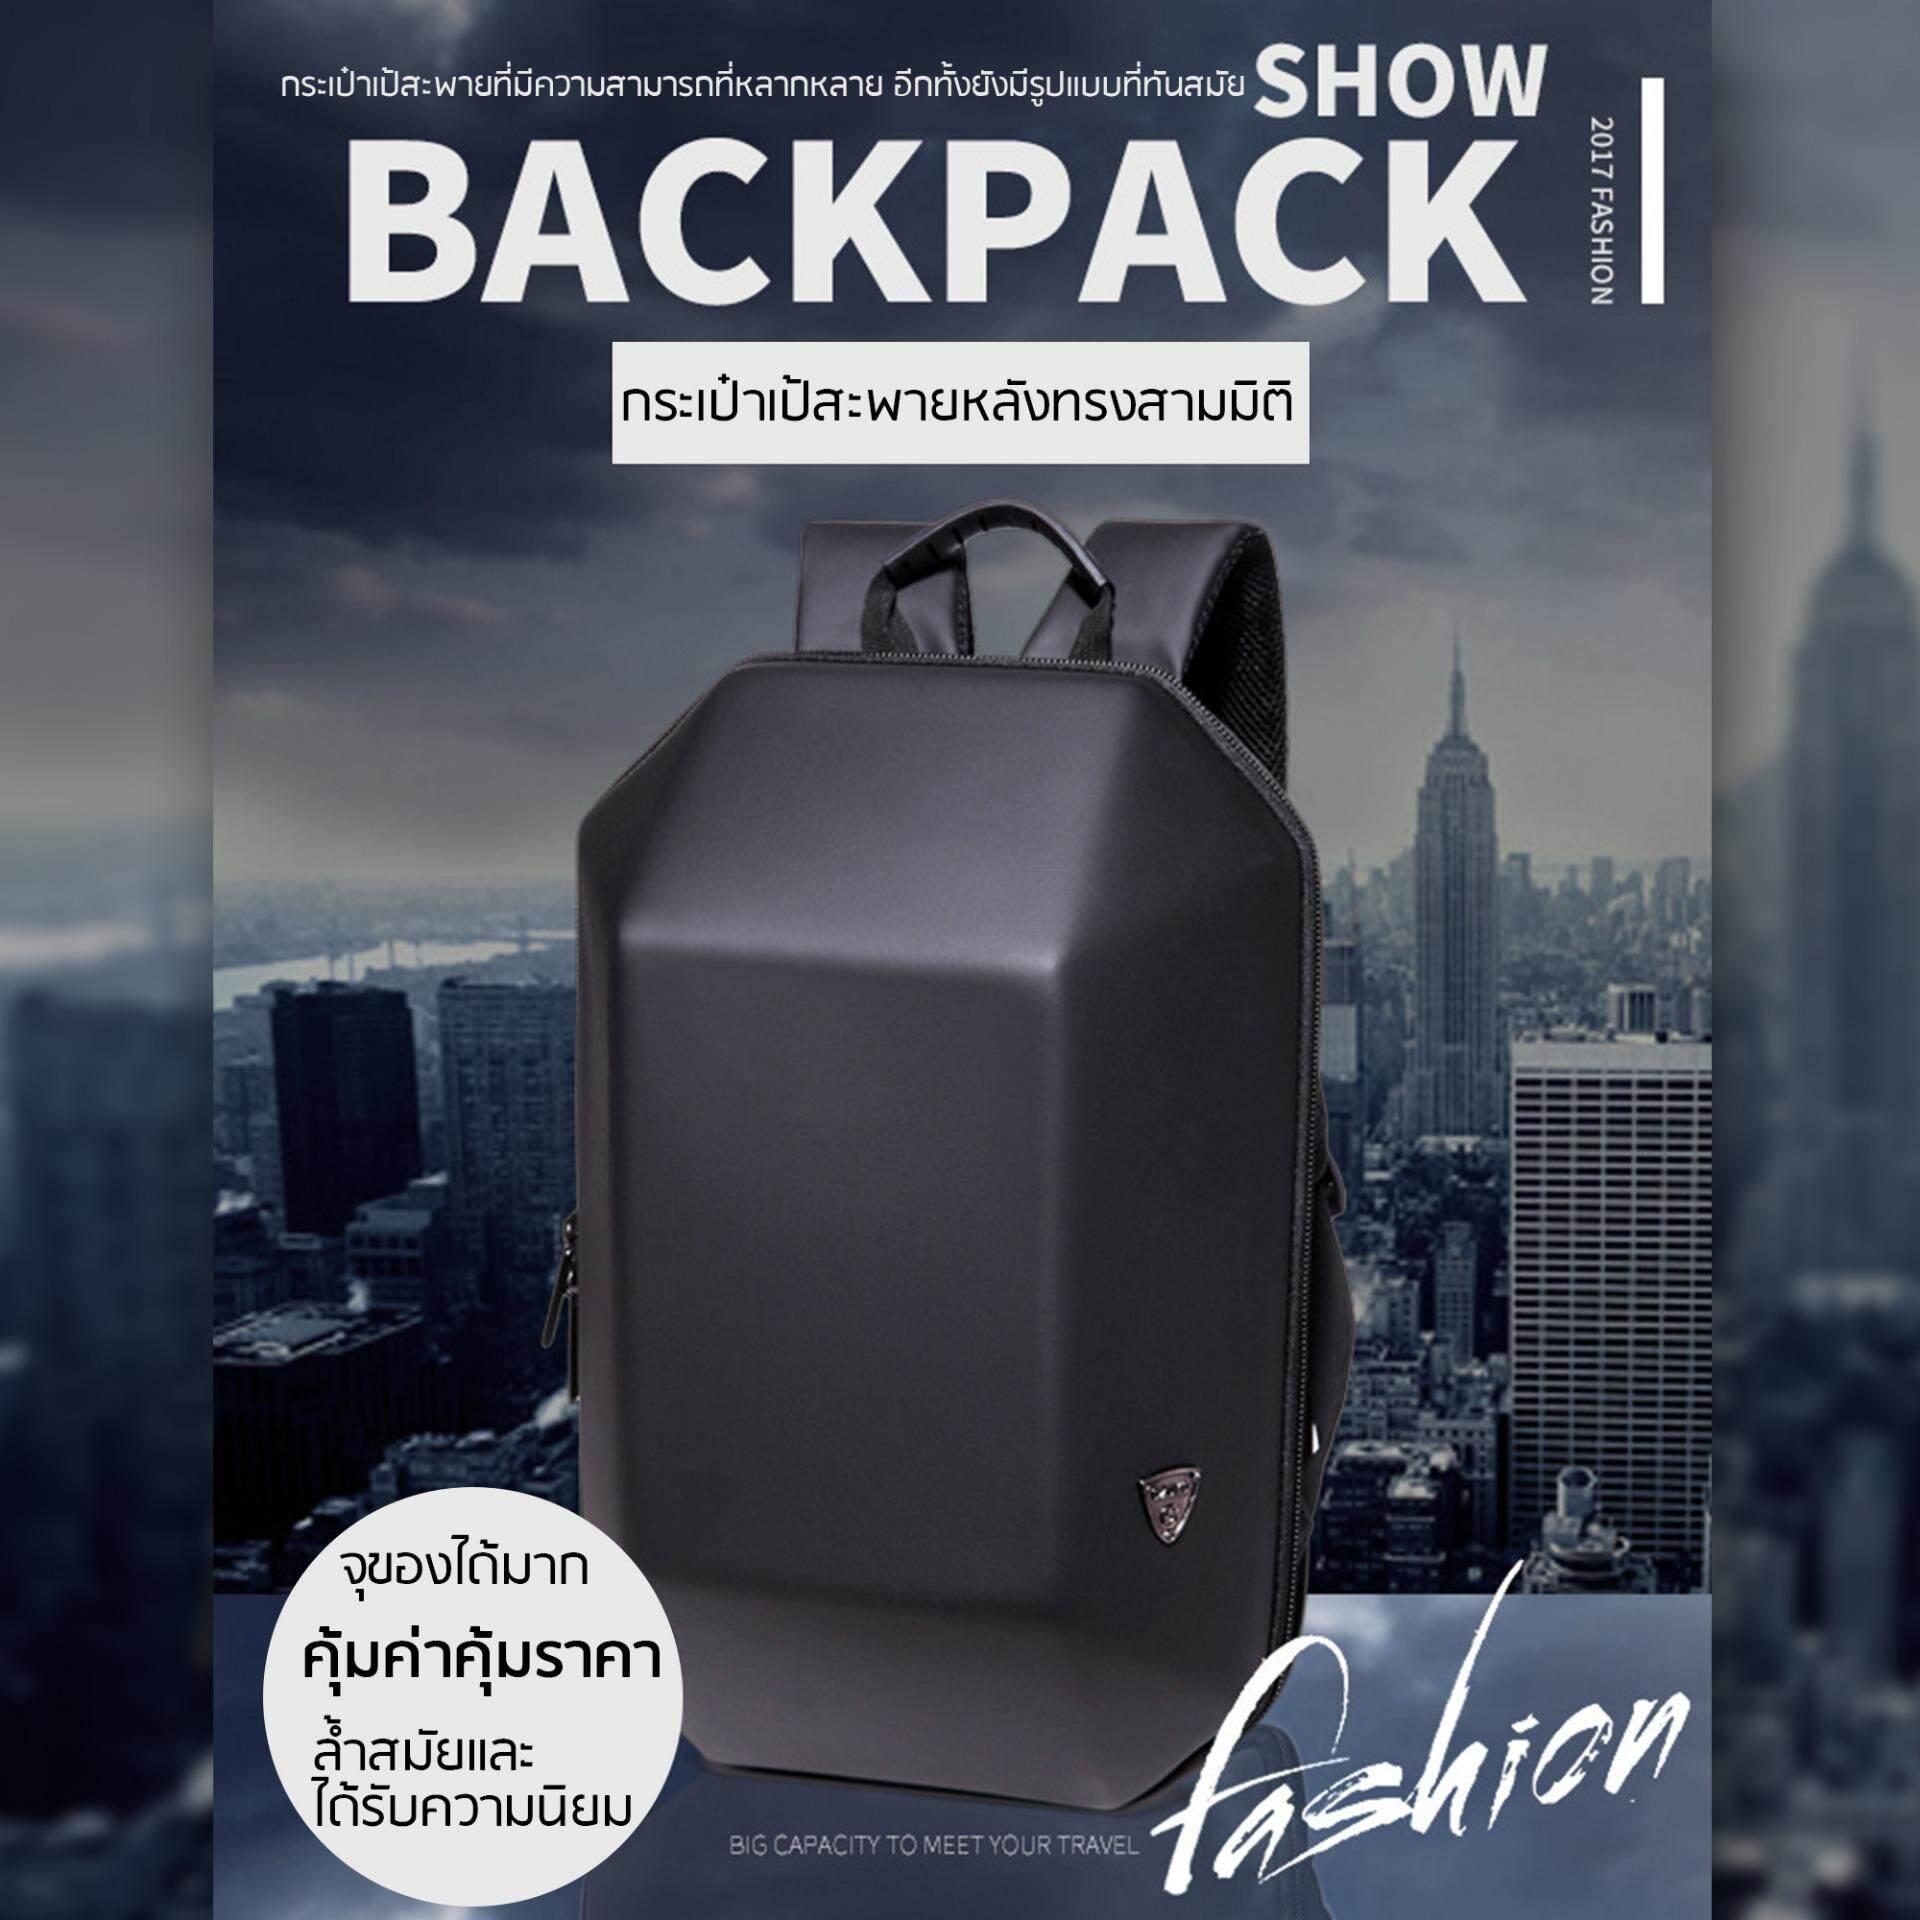 Backpack Ozuko กระเป๋าถือ สพายหลัง รูปทรง 3D คงทนแข็งแรงใส่ของได้เยอะมีช่องซิปภายใน Notebook แฟ้มเอกสาร เสื้อผ้า โทรศัพท์มือถือ อื่นๆ สีดำ Ozuko ถูก ใน กรุงเทพมหานคร